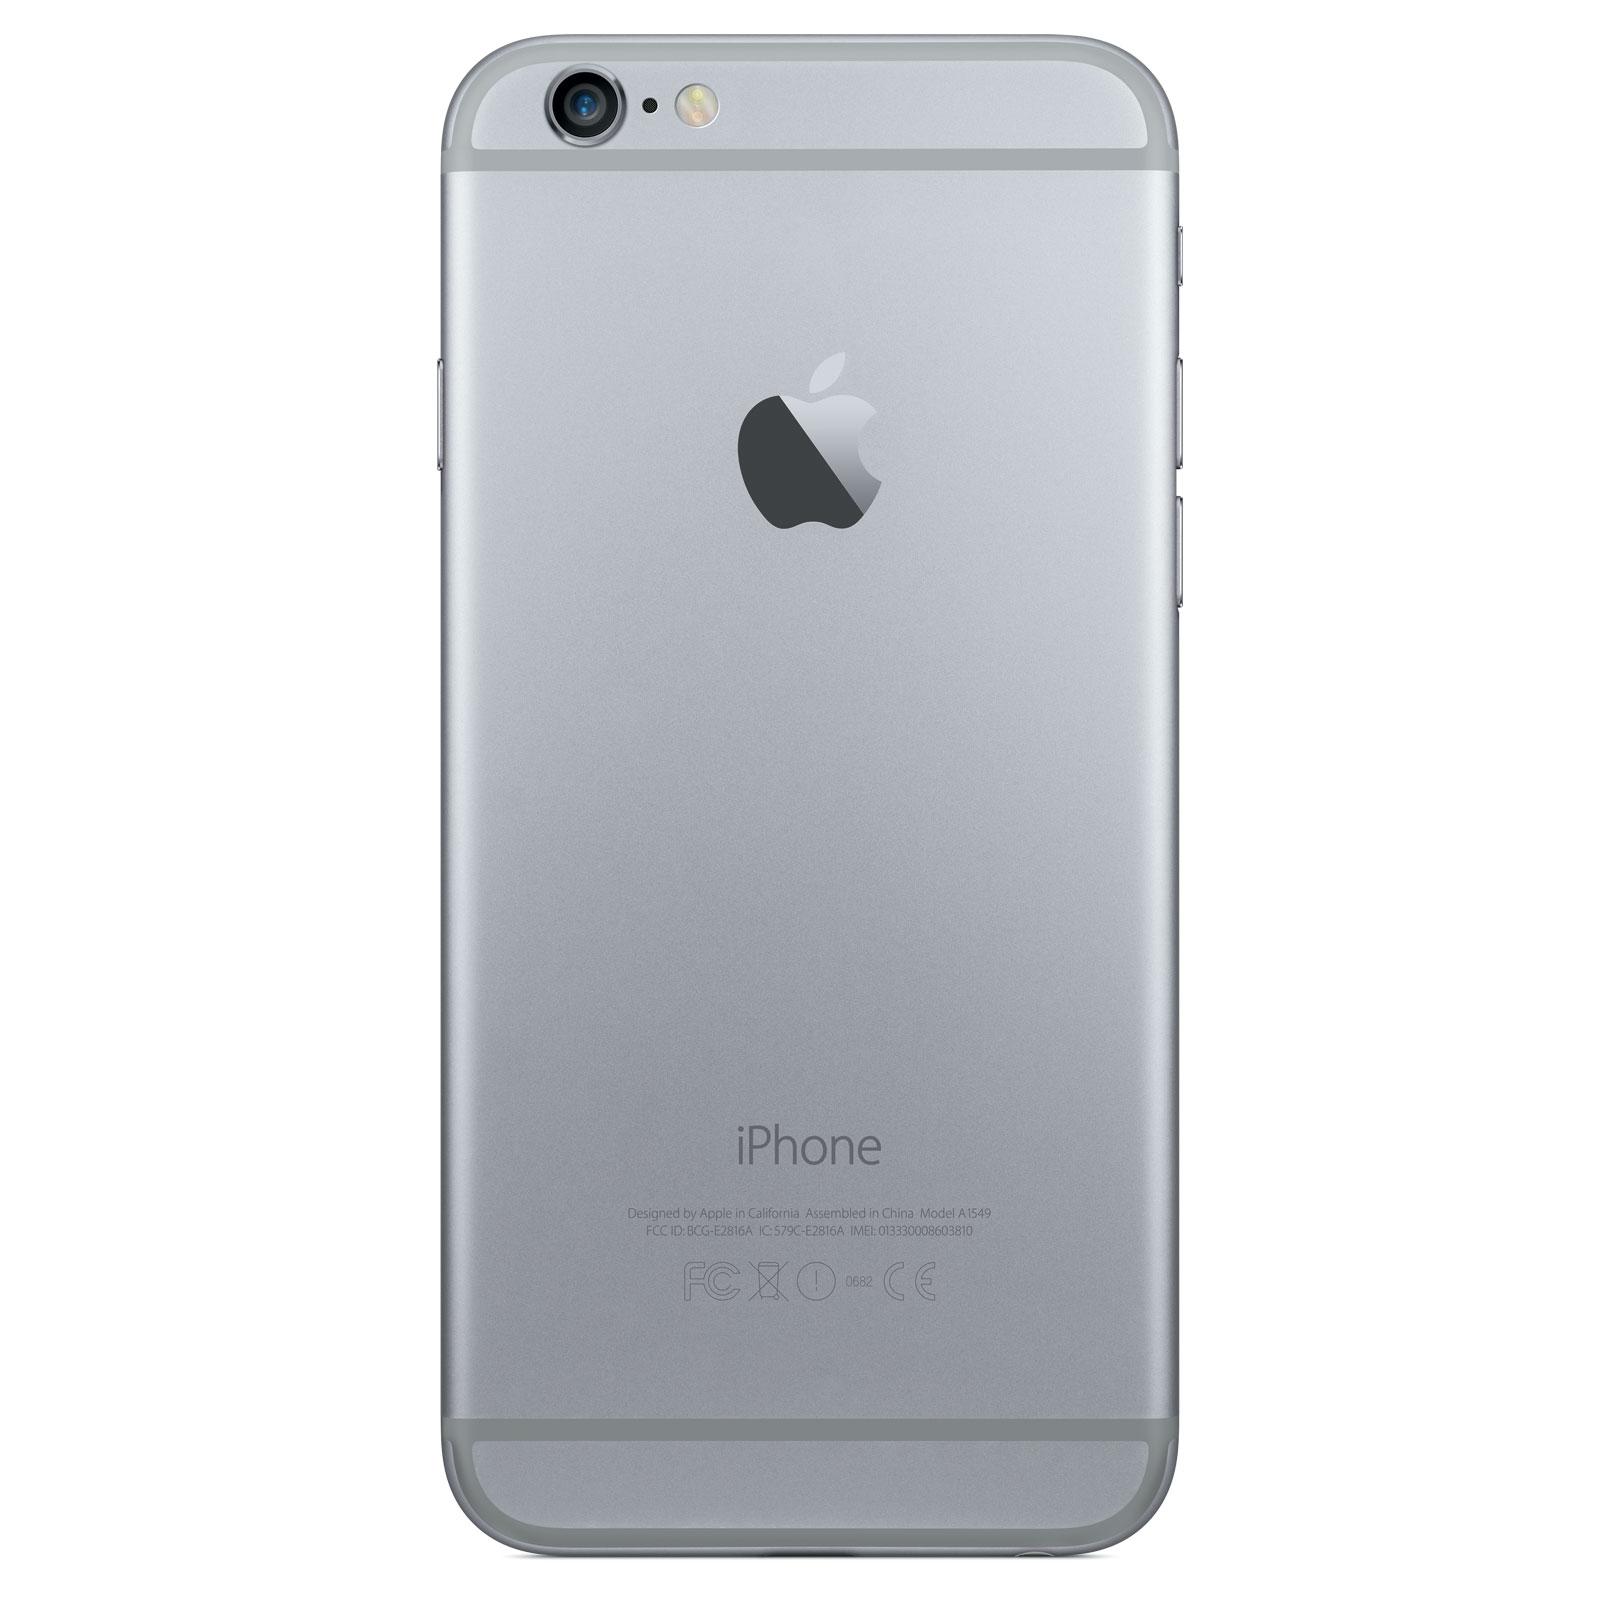 apple iphone 6 32 go gris sid ral mobile smartphone apple sur ldlc. Black Bedroom Furniture Sets. Home Design Ideas